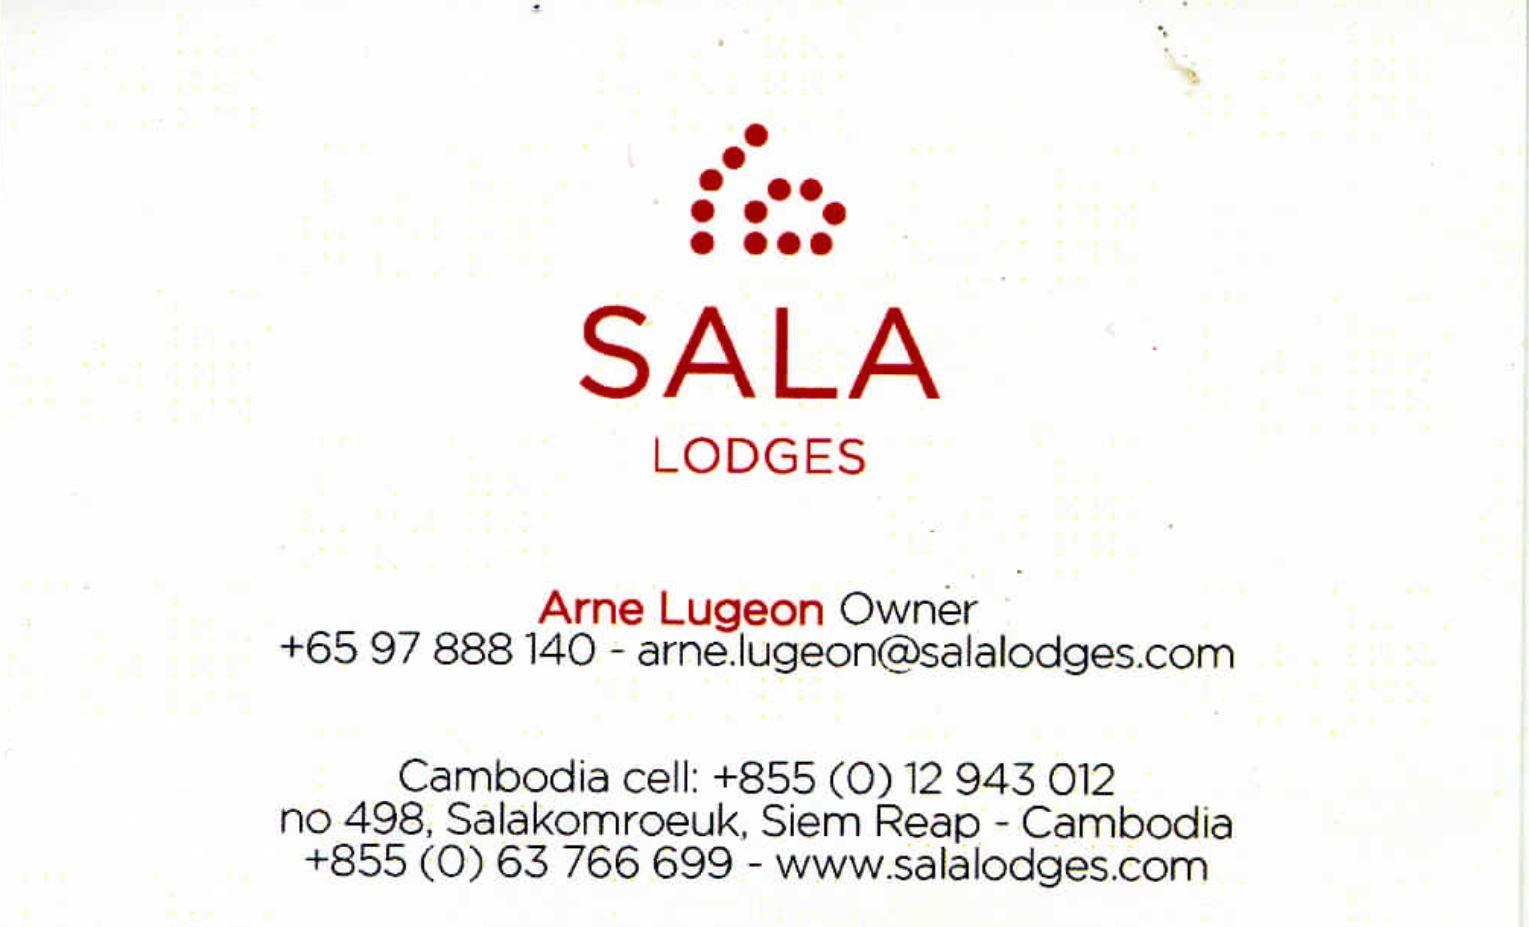 Sala Lodges, Arne Lugeon, Owner